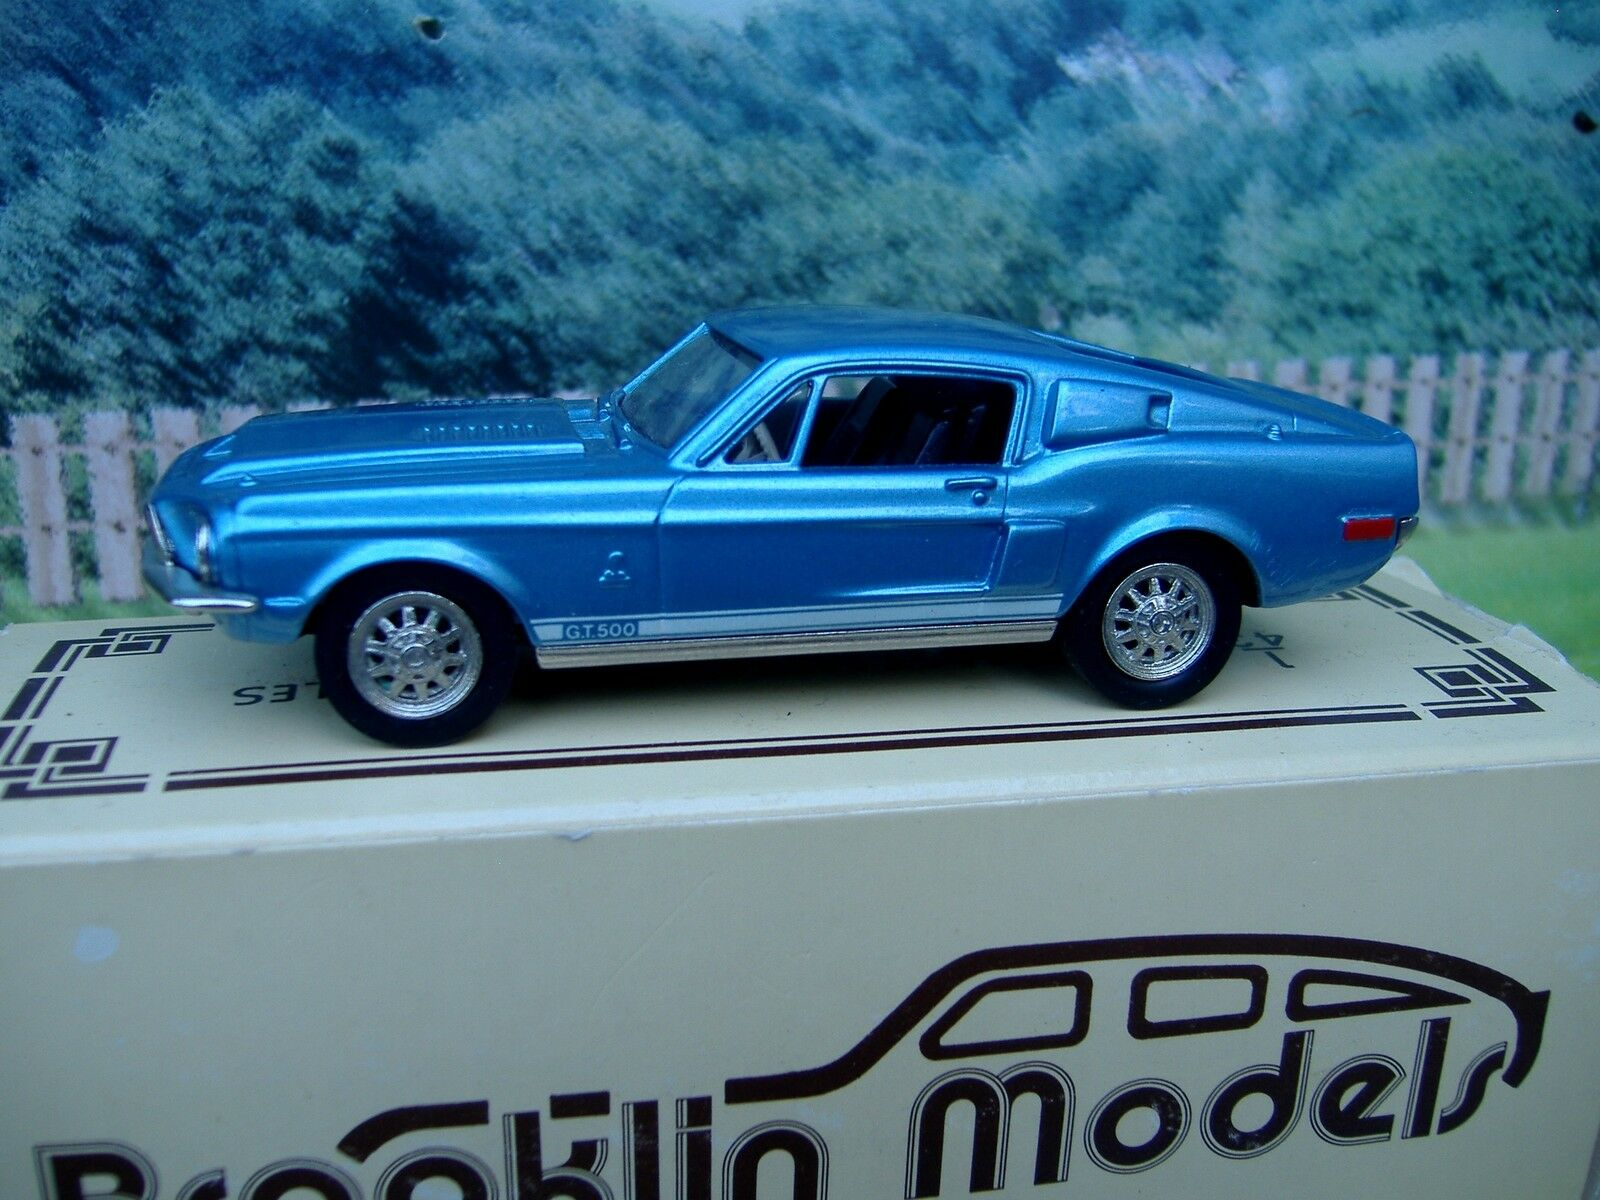 1  43 Brooklinmodelllllerler Ford mustang 1968